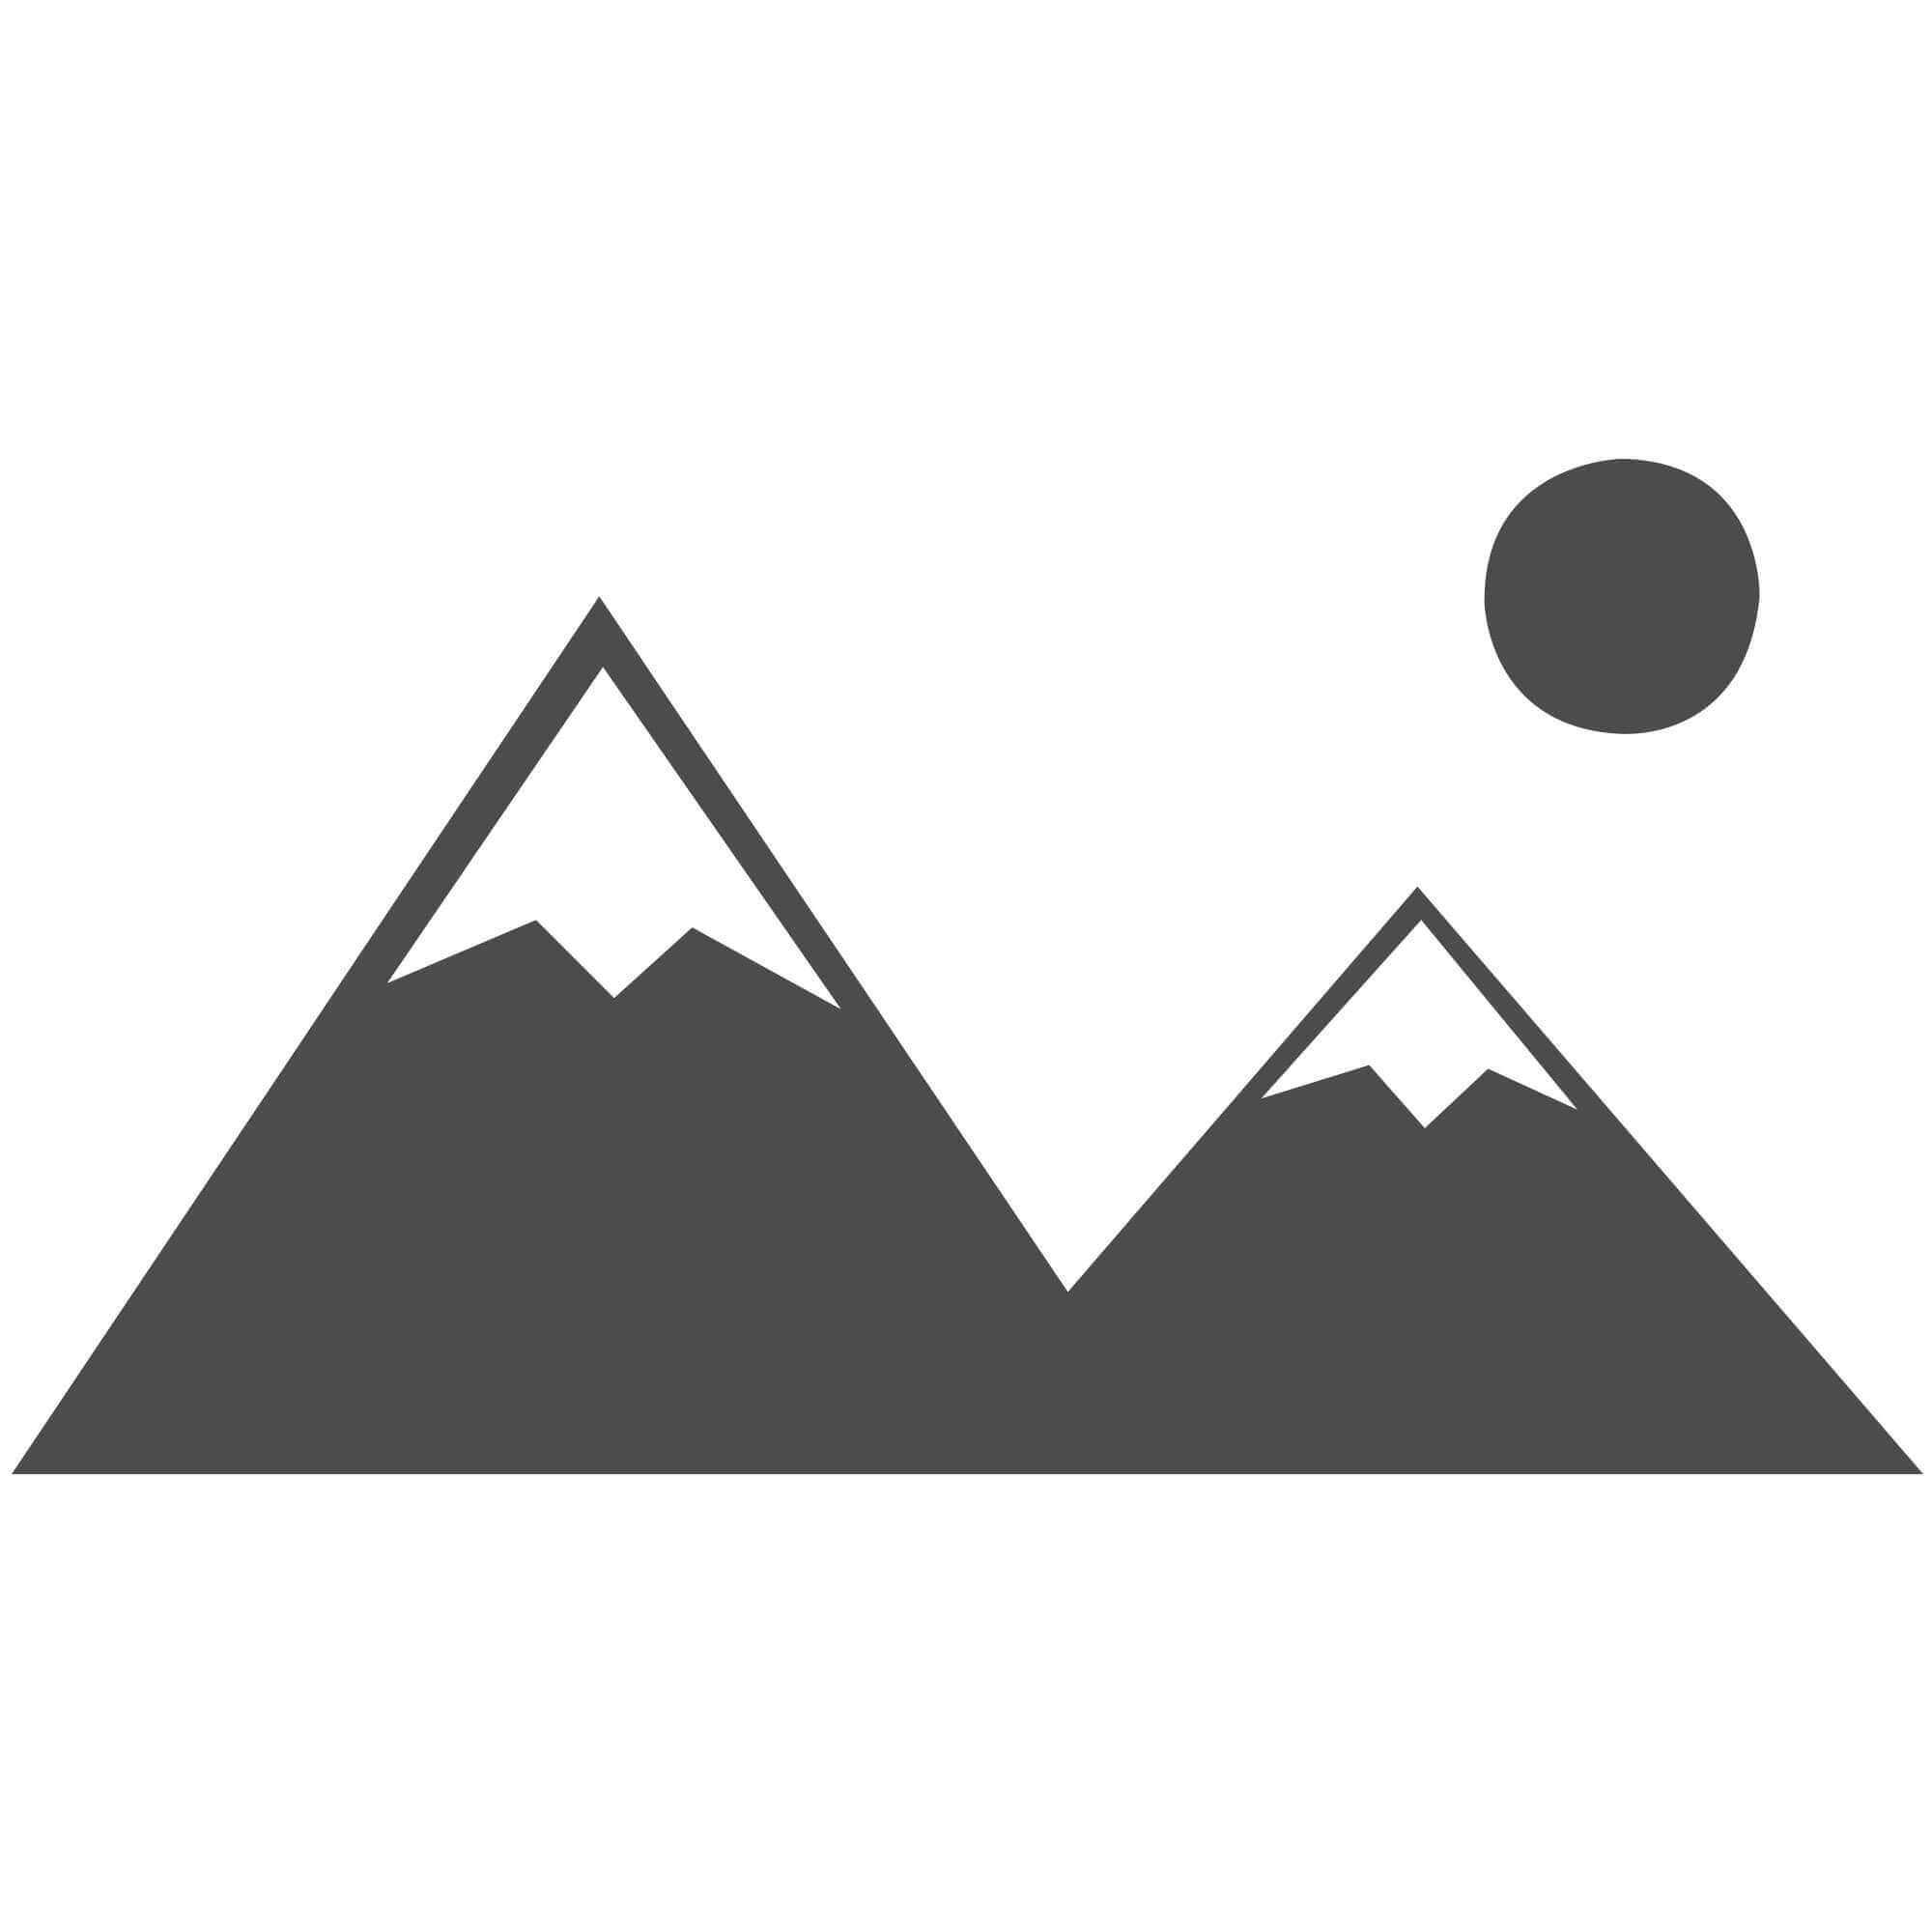 "Verge Ombre Rug - Ochre Yellow - Size 120 x 170 cm (4' x 5'7"")"